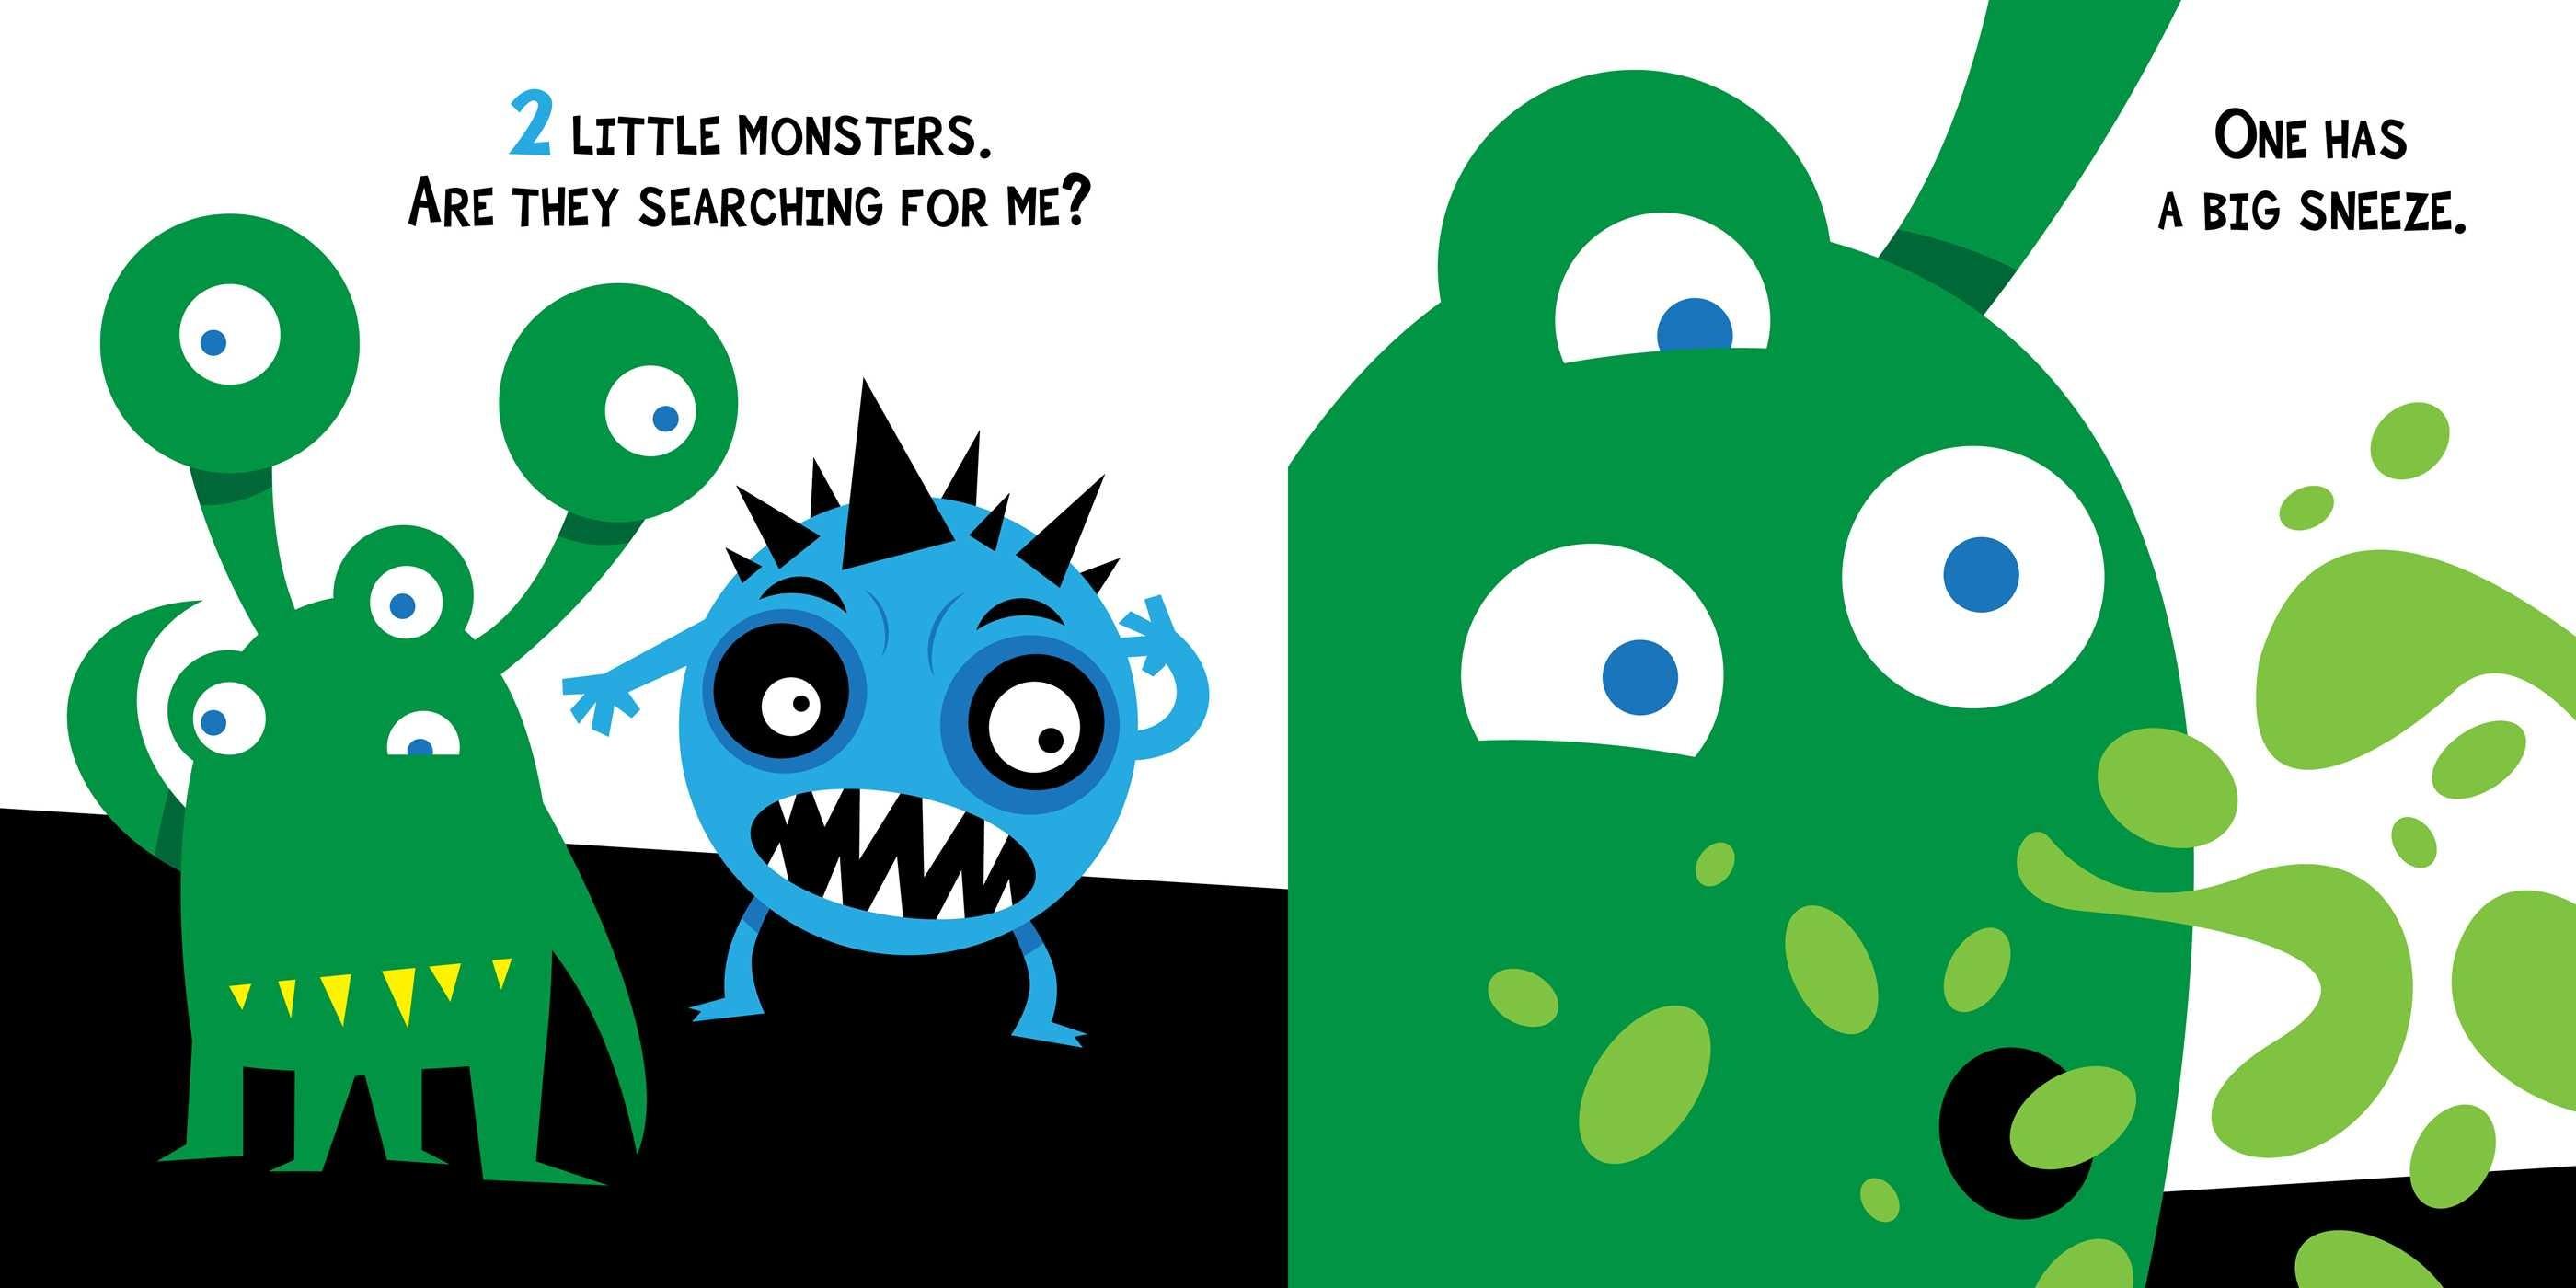 One little monster 9781534406742.in03